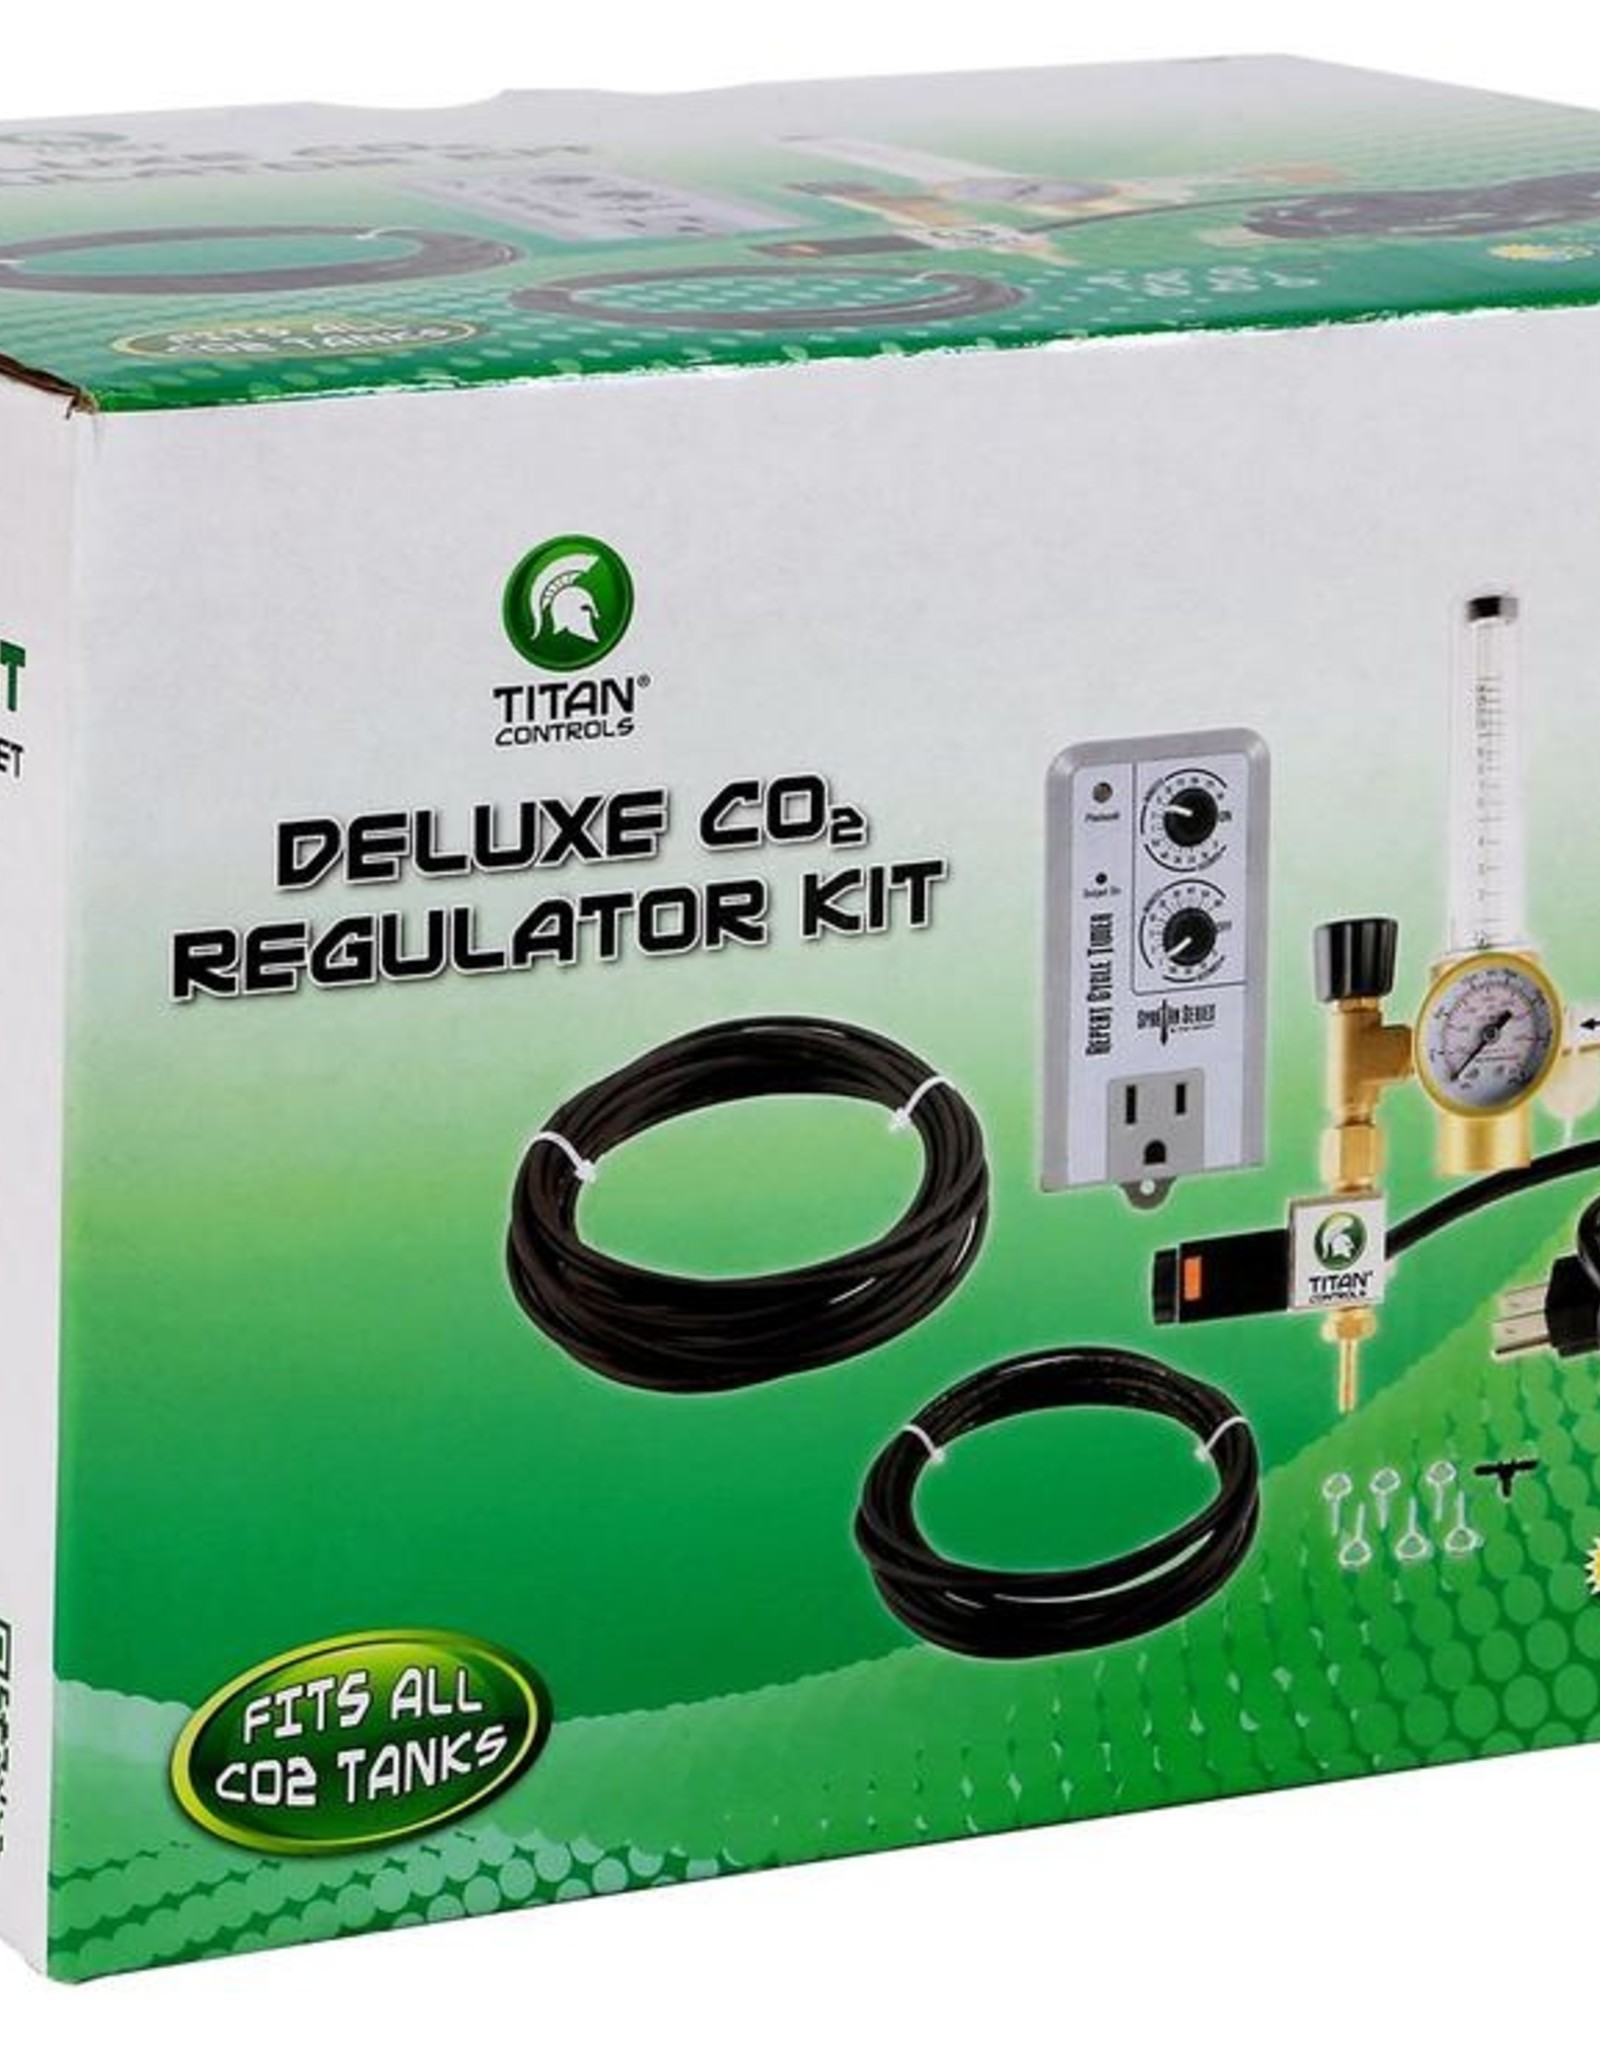 TITAN CONTROLS Titan Controls Deluxe CO2 Regulator Kit w/ Timer